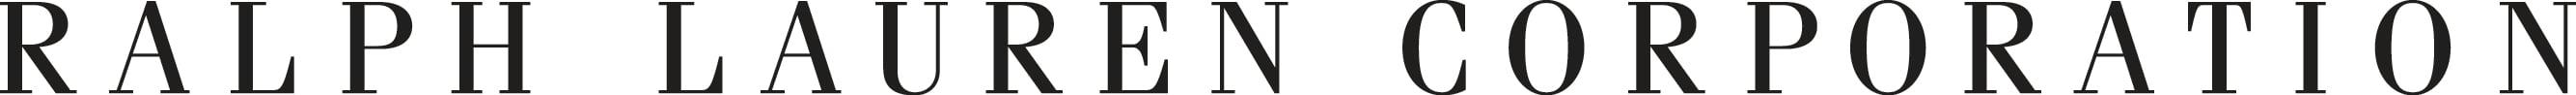 ralph lauren corporation logo